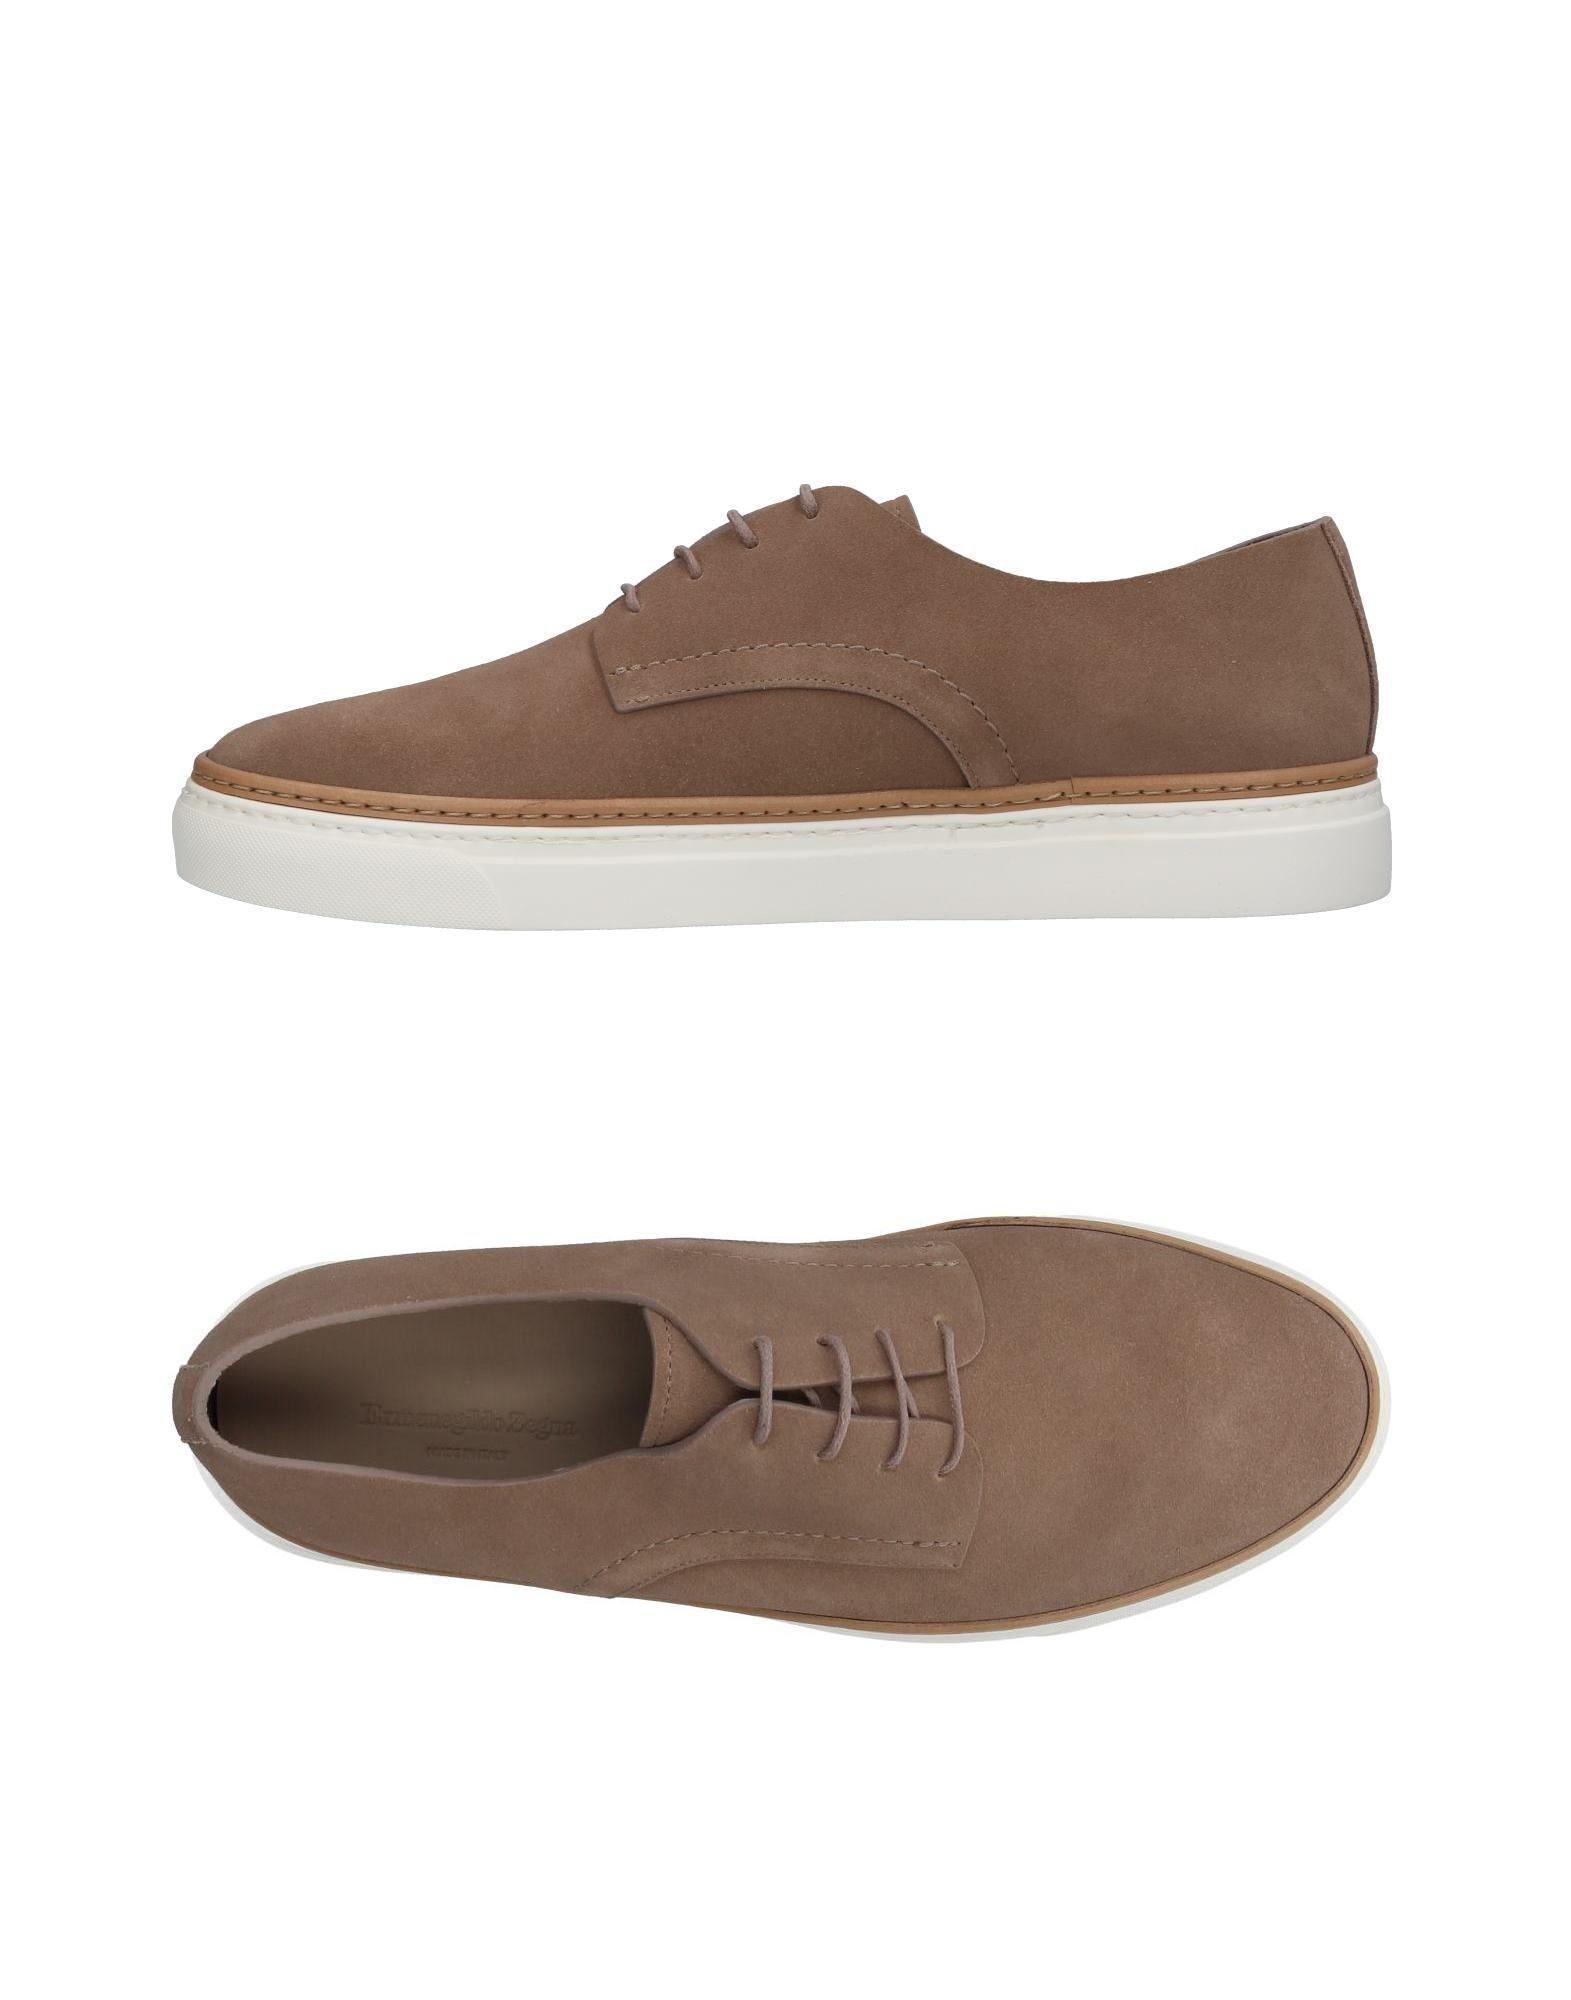 Ermenegildo Zegna Sneakers Herren  11390971TL Gute Qualität beliebte Schuhe